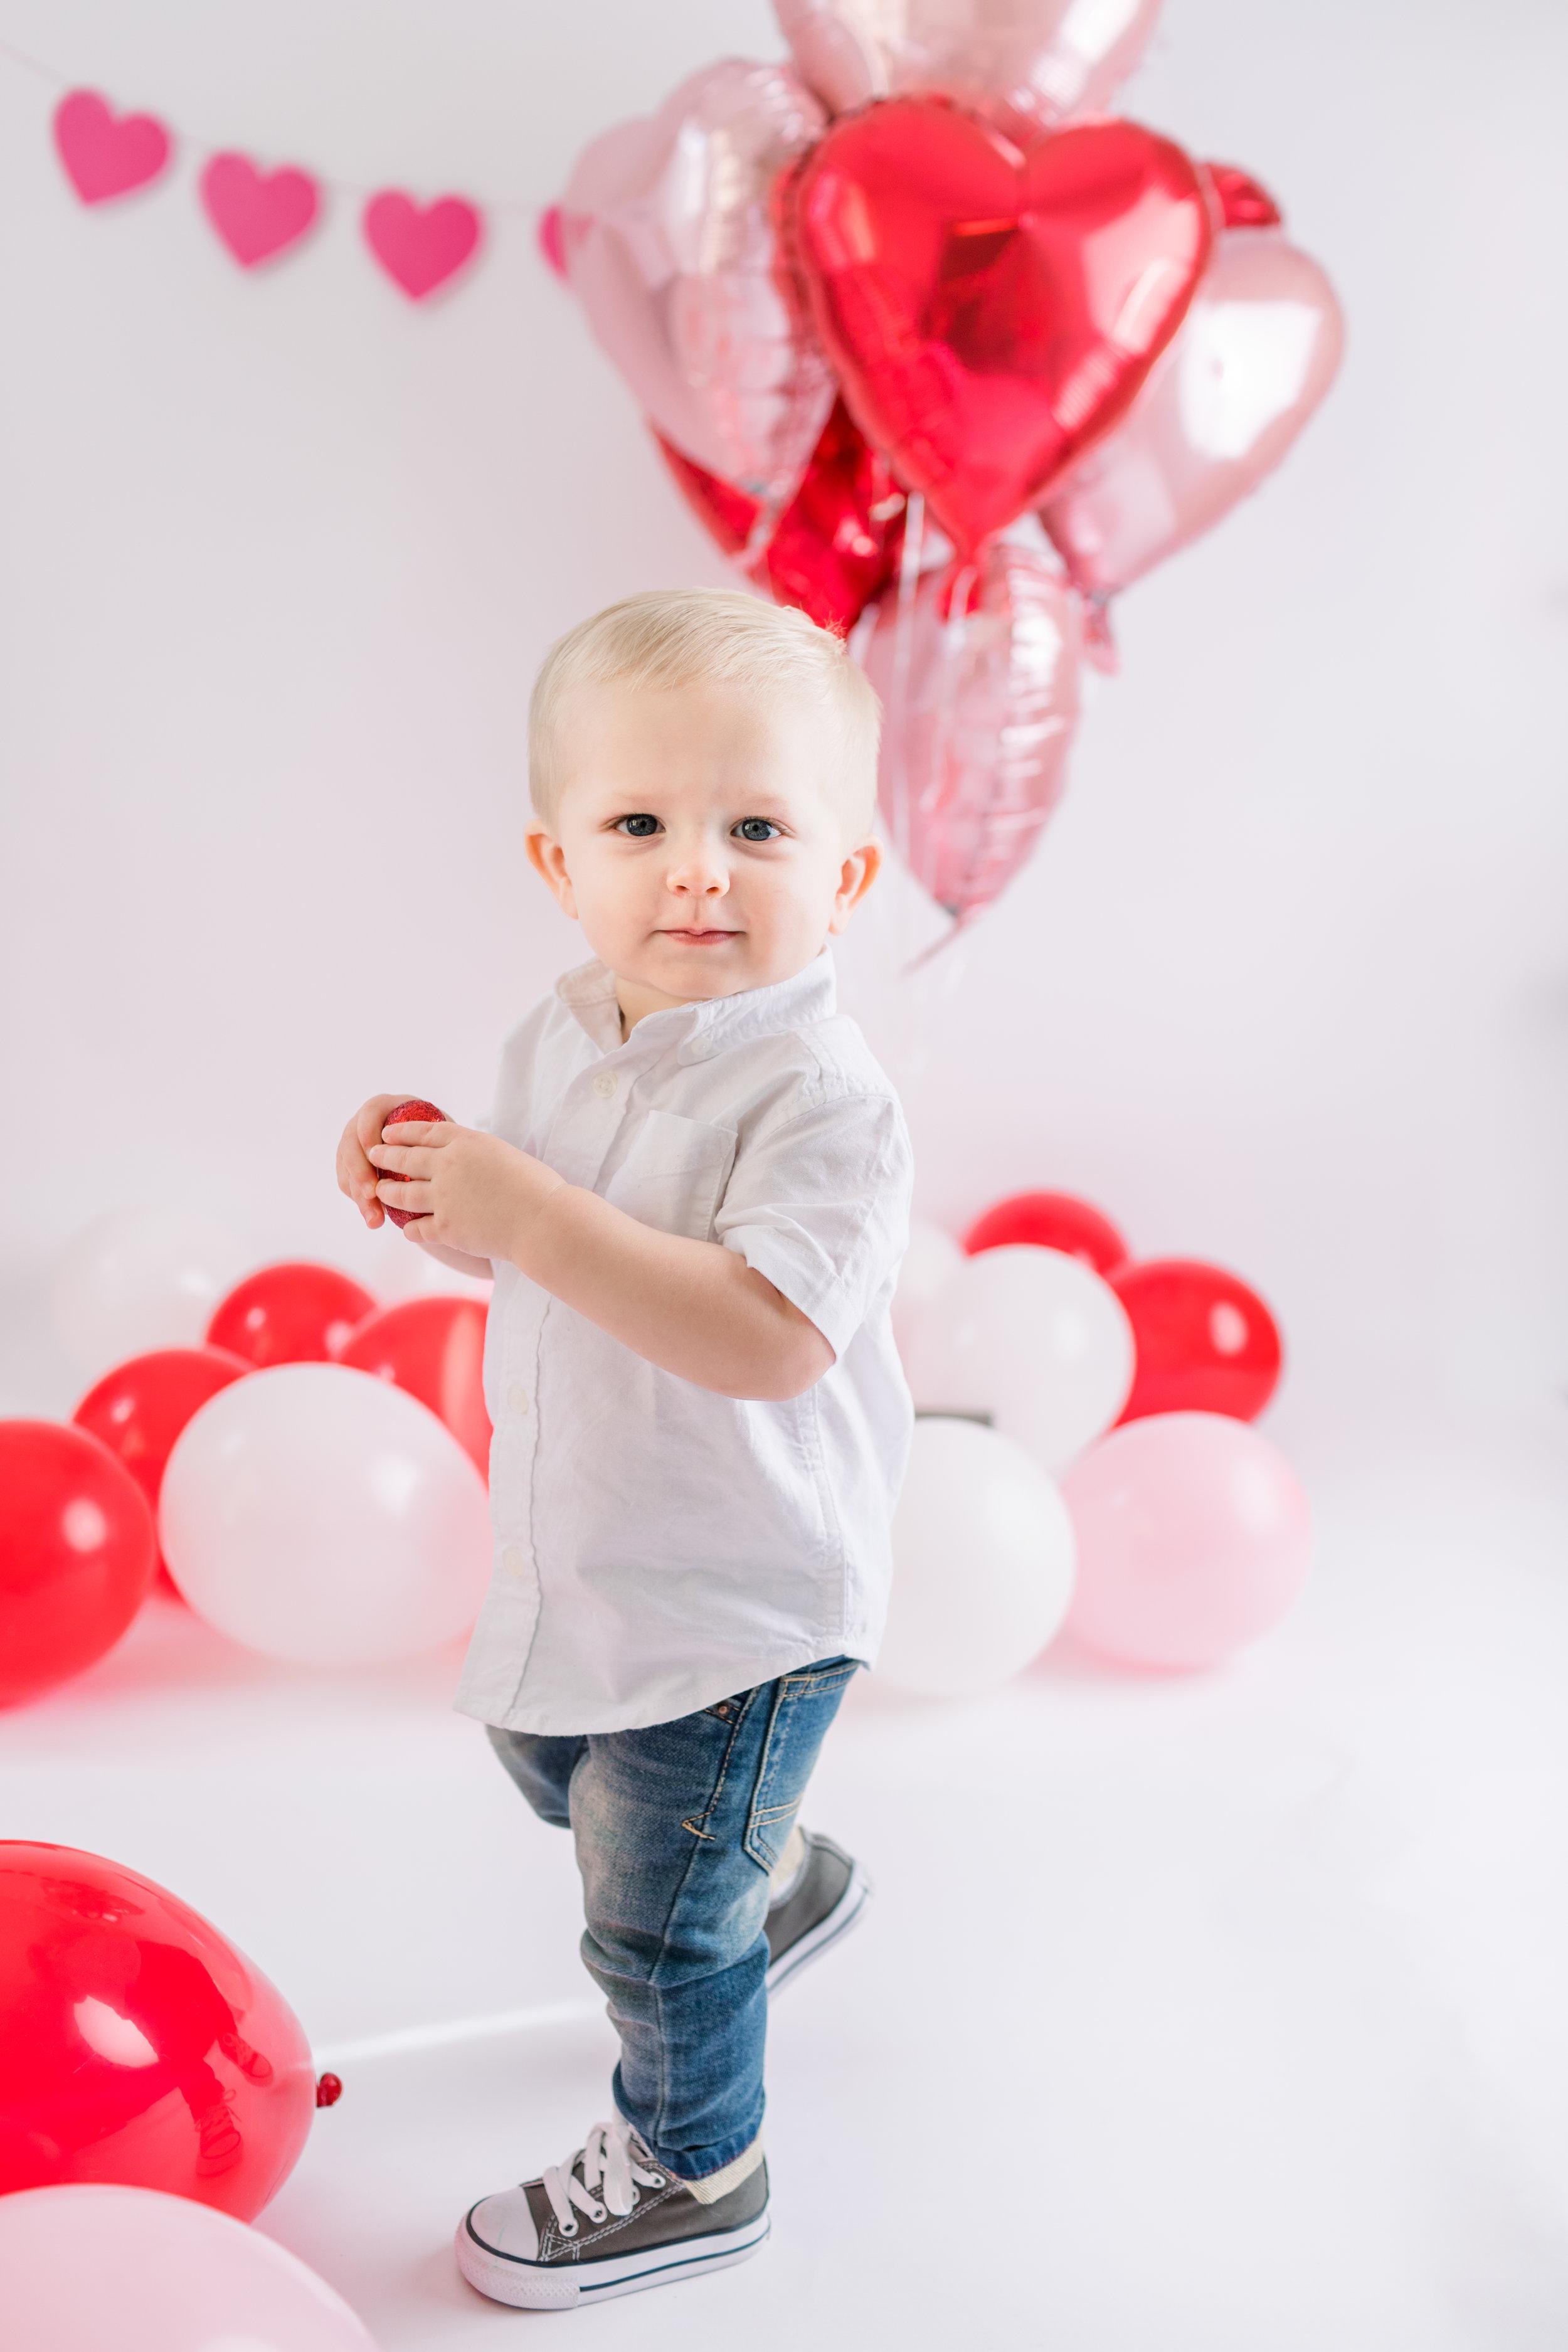 alexis-belli-newborn-kids-photographer-based-in-florida-boys-photo-shoot